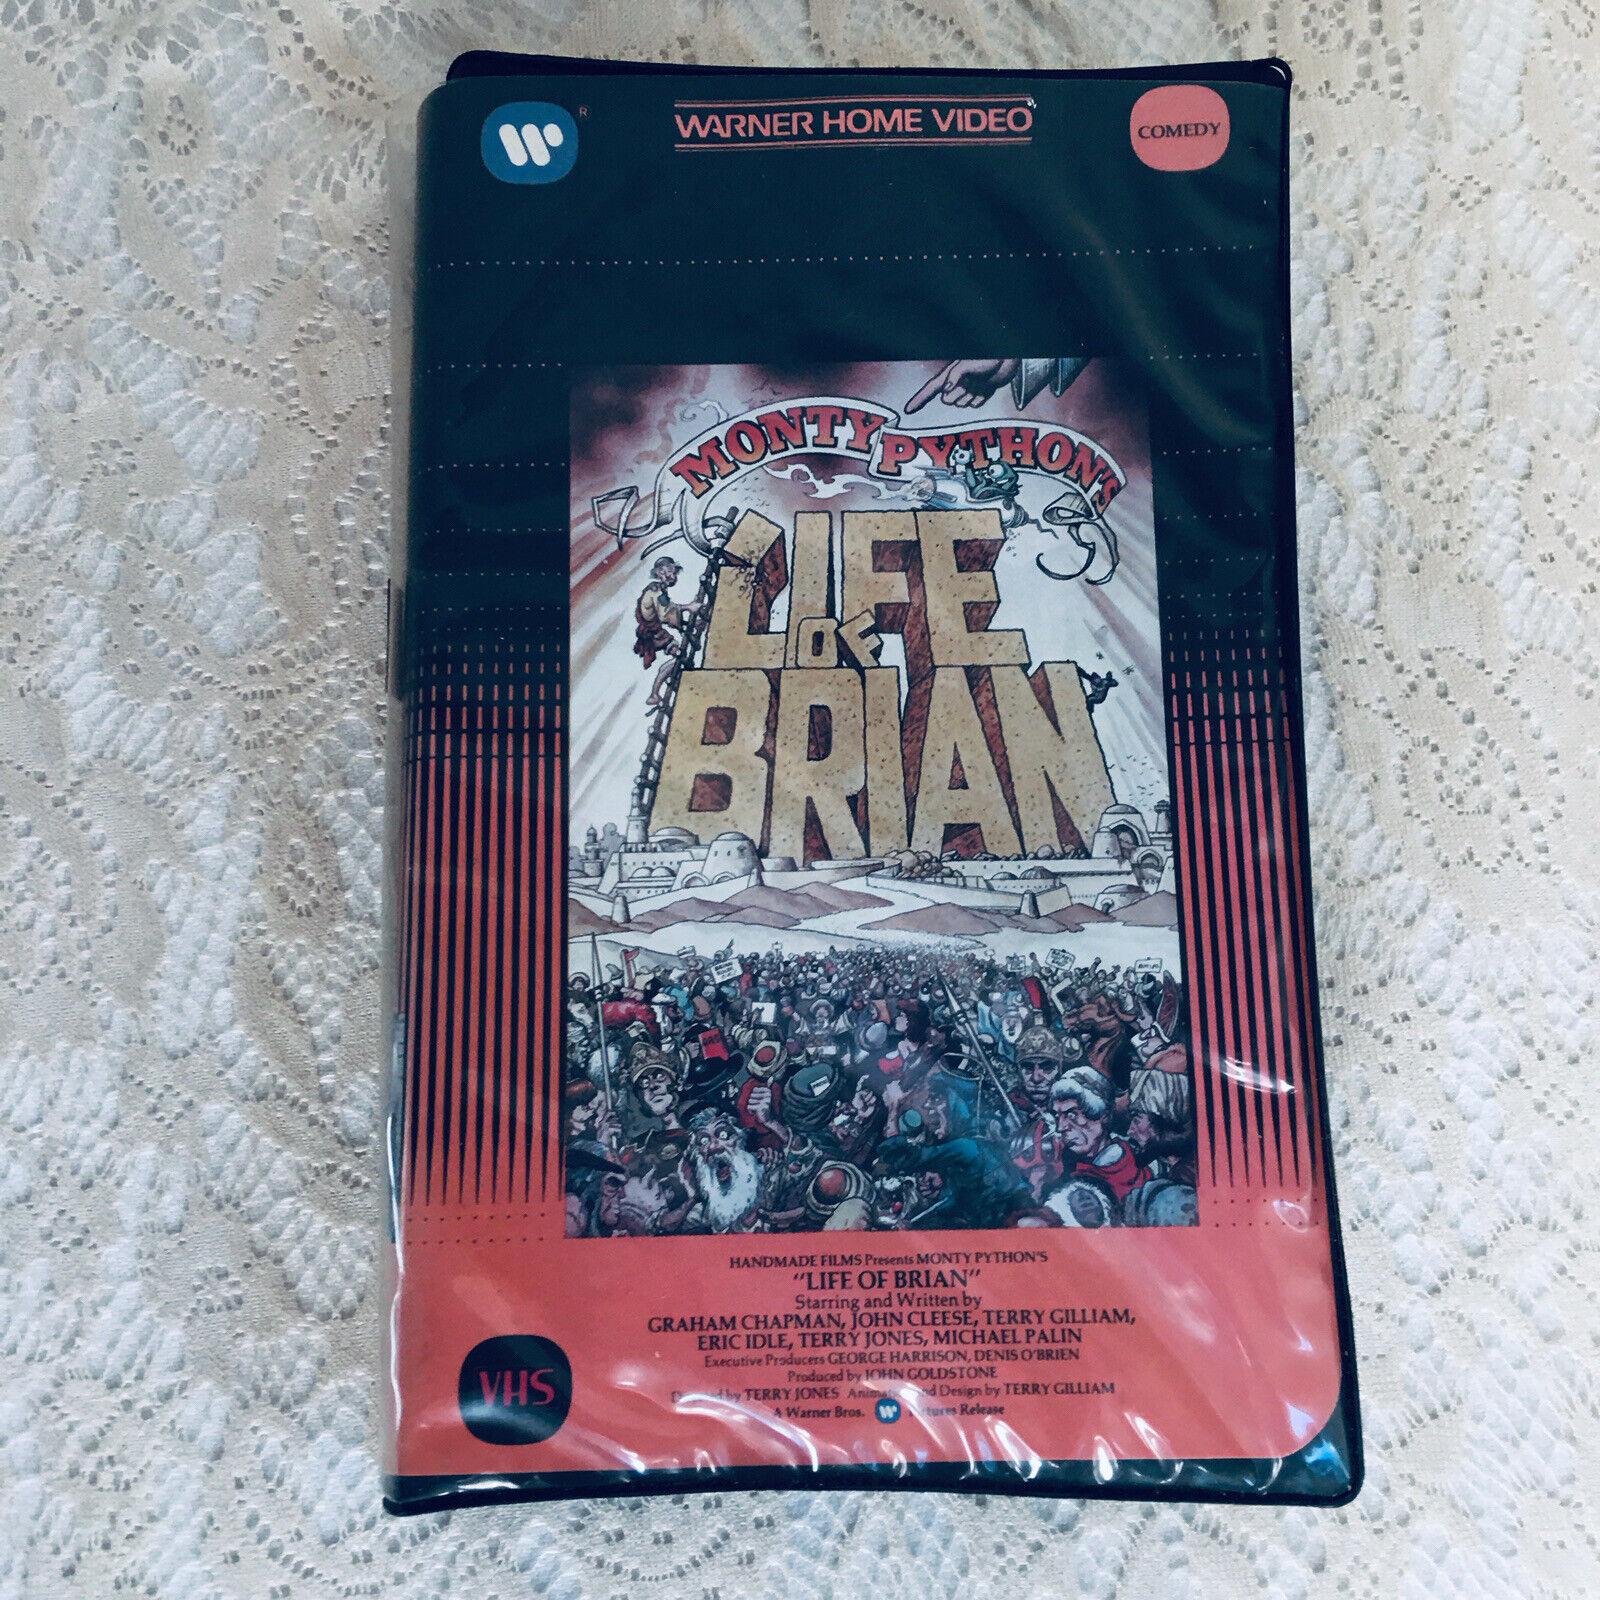 Monty Pythons Life Of Brian Vhs For Sale Online Ebay